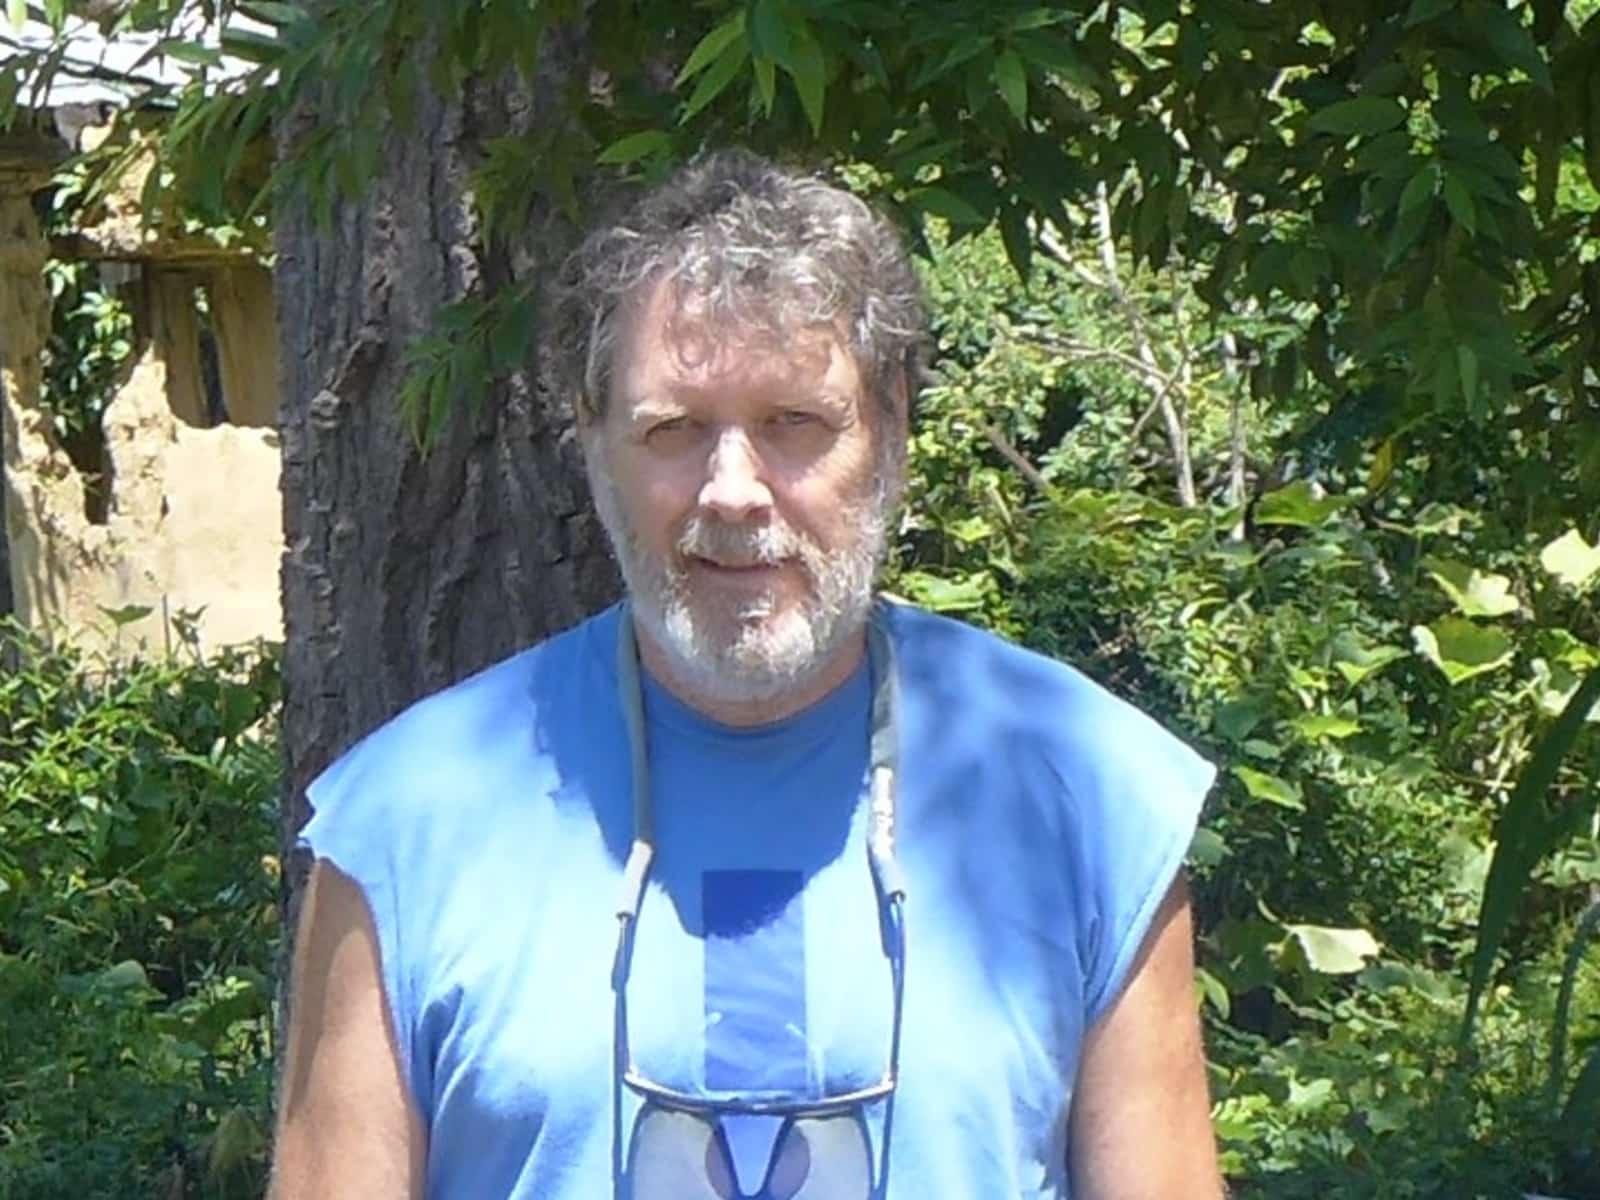 Robert from Marathon, Florida, United States